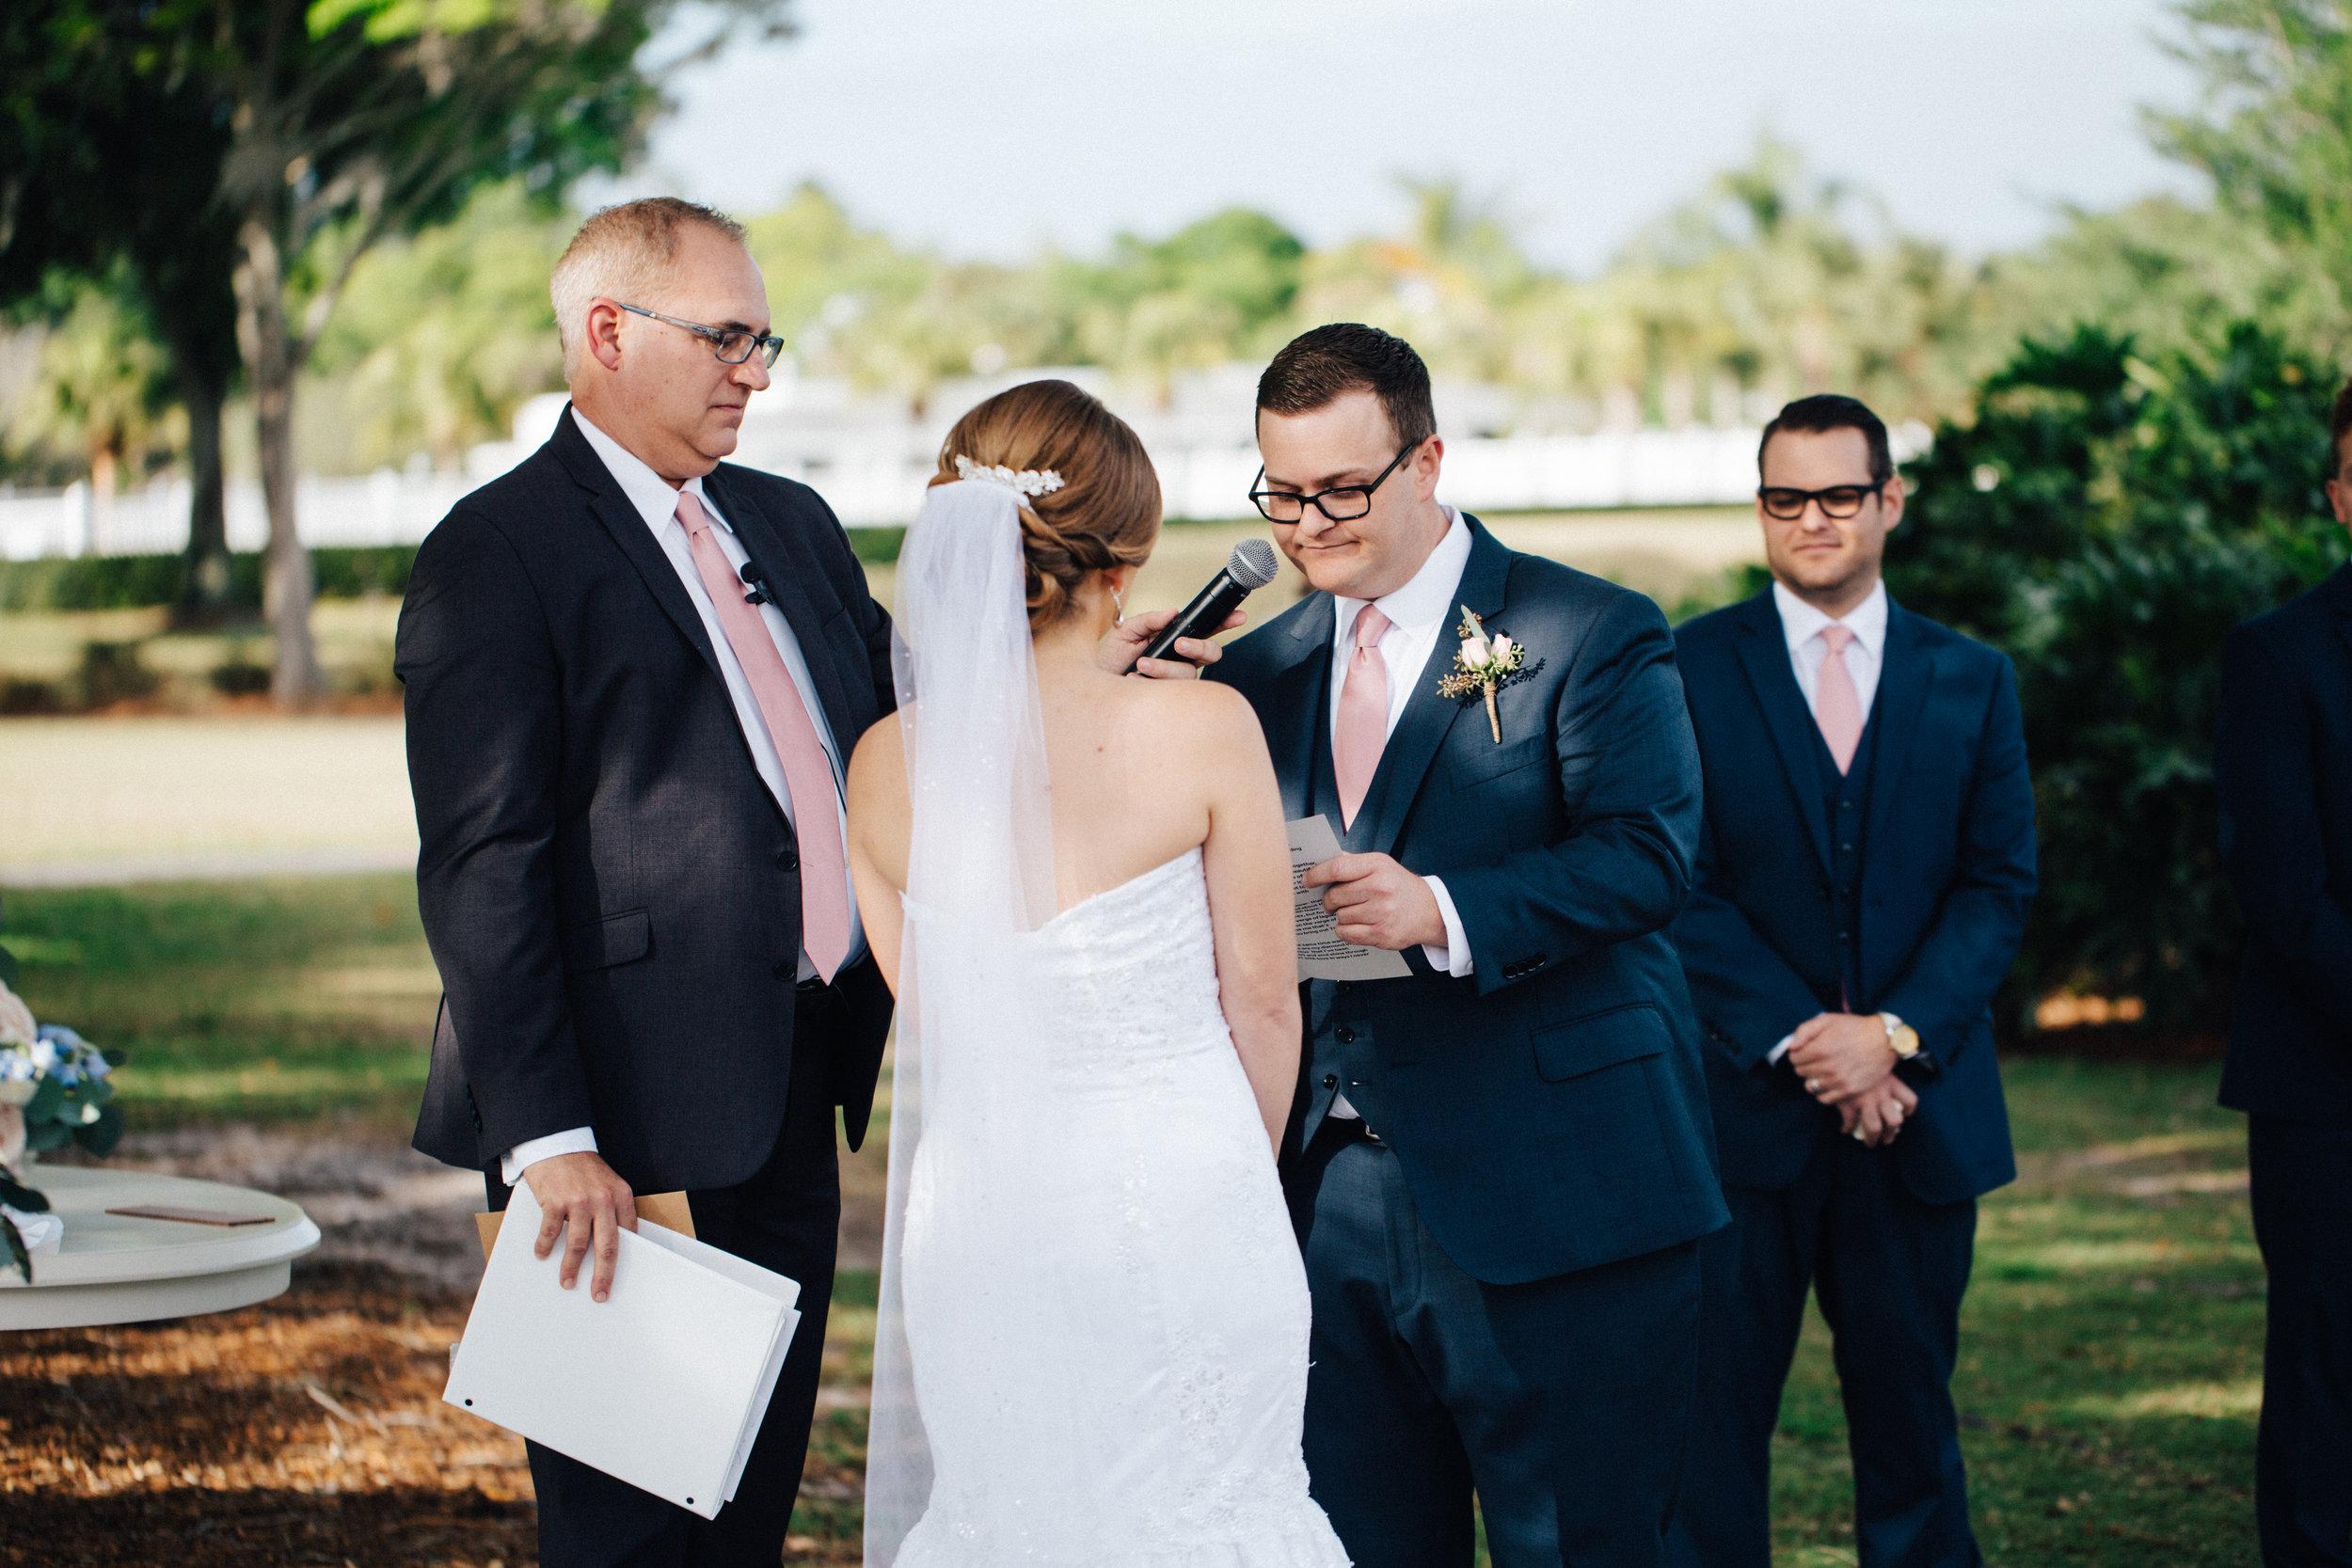 Tuskawilla Country Club Wedding Photographer-63.jpg